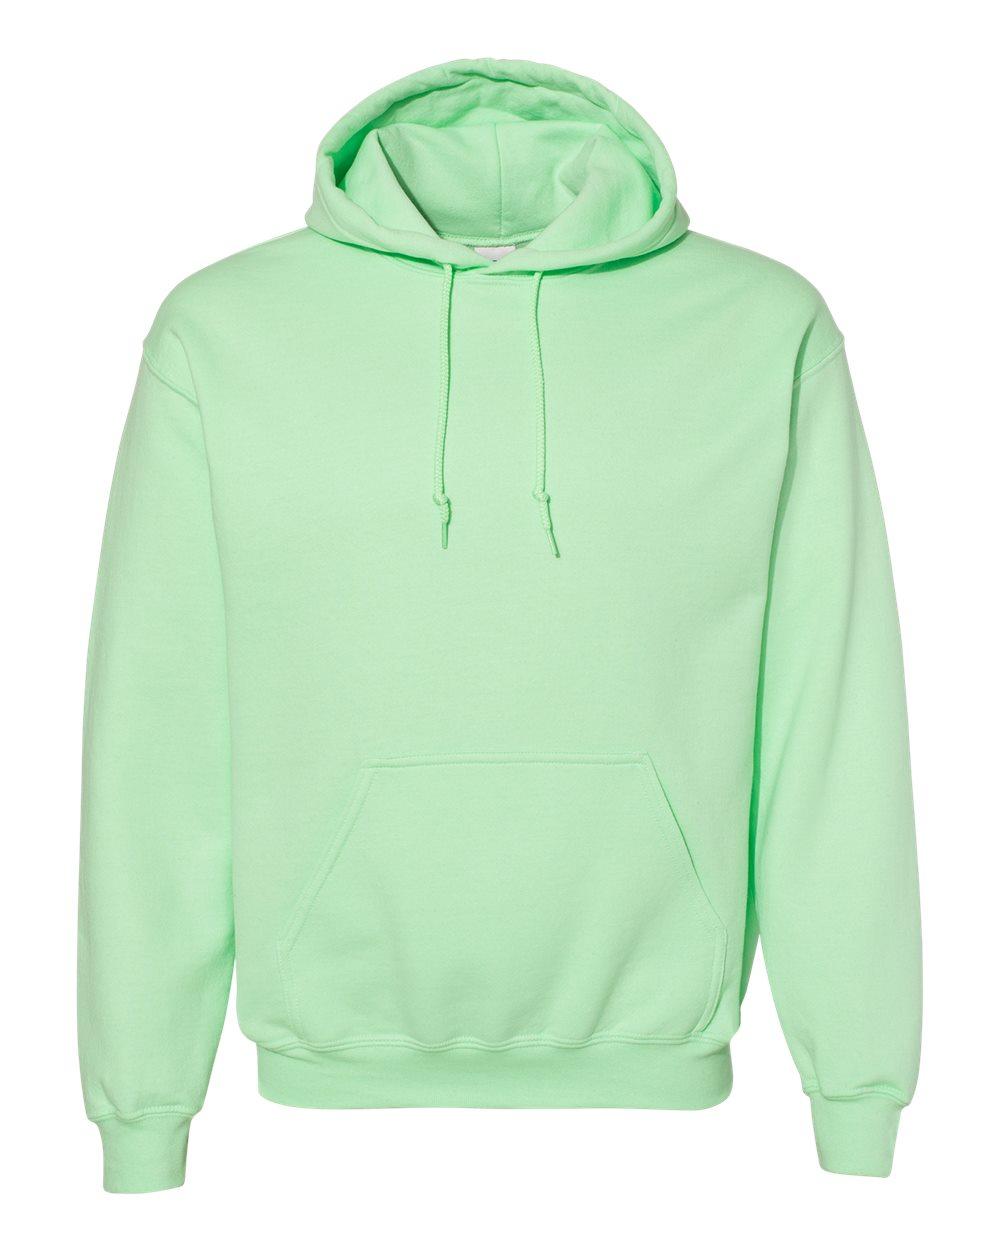 Gildan-Mens-Blank-Hoodie-Heavy-Blend-Hooded-Sweatshirt-Solid-18500-up-to-5XL thumbnail 62